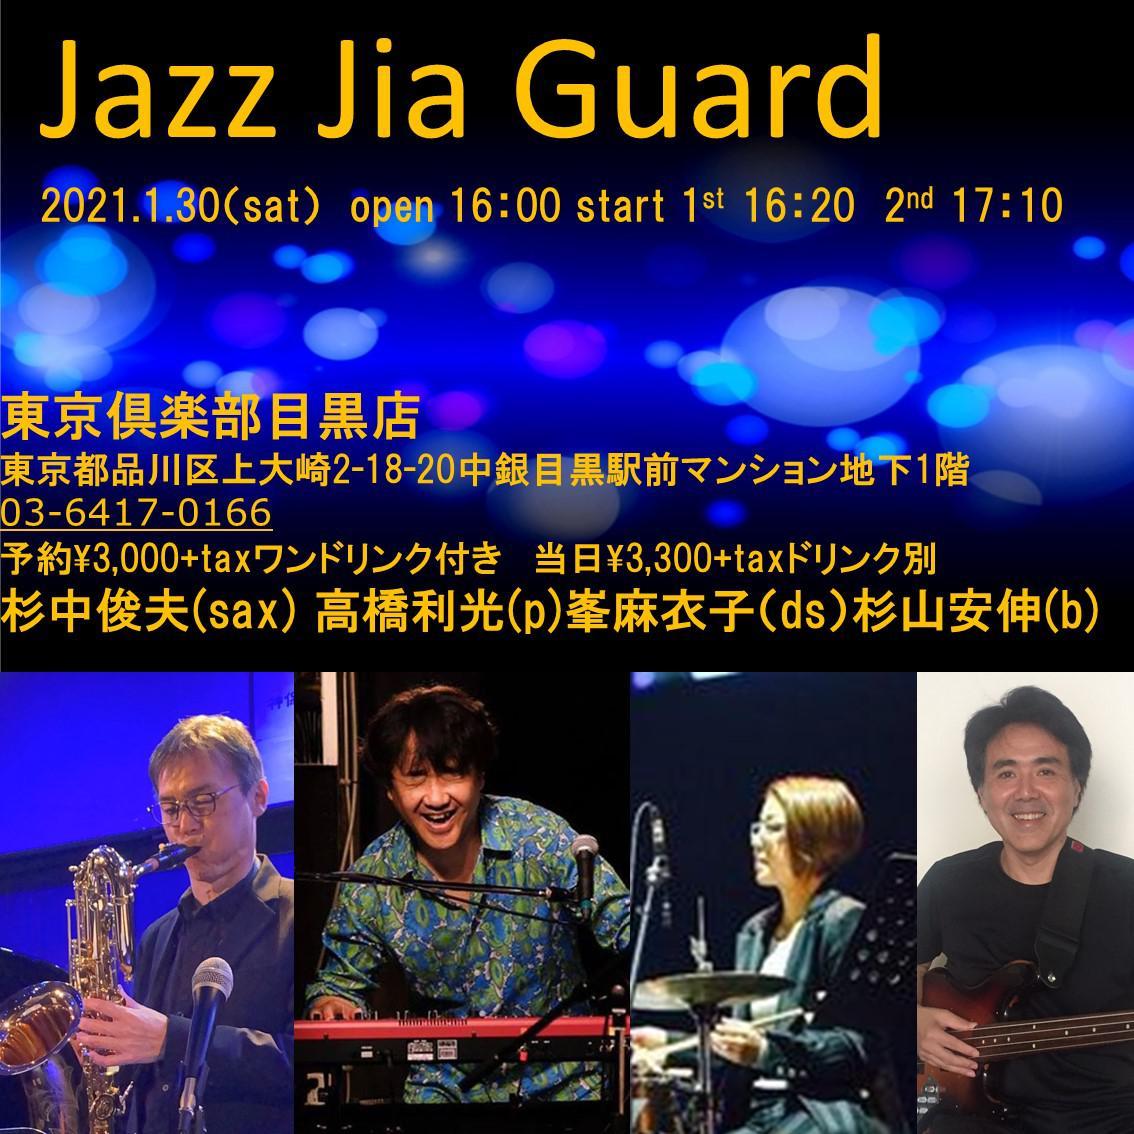 Jazz Jia Guard